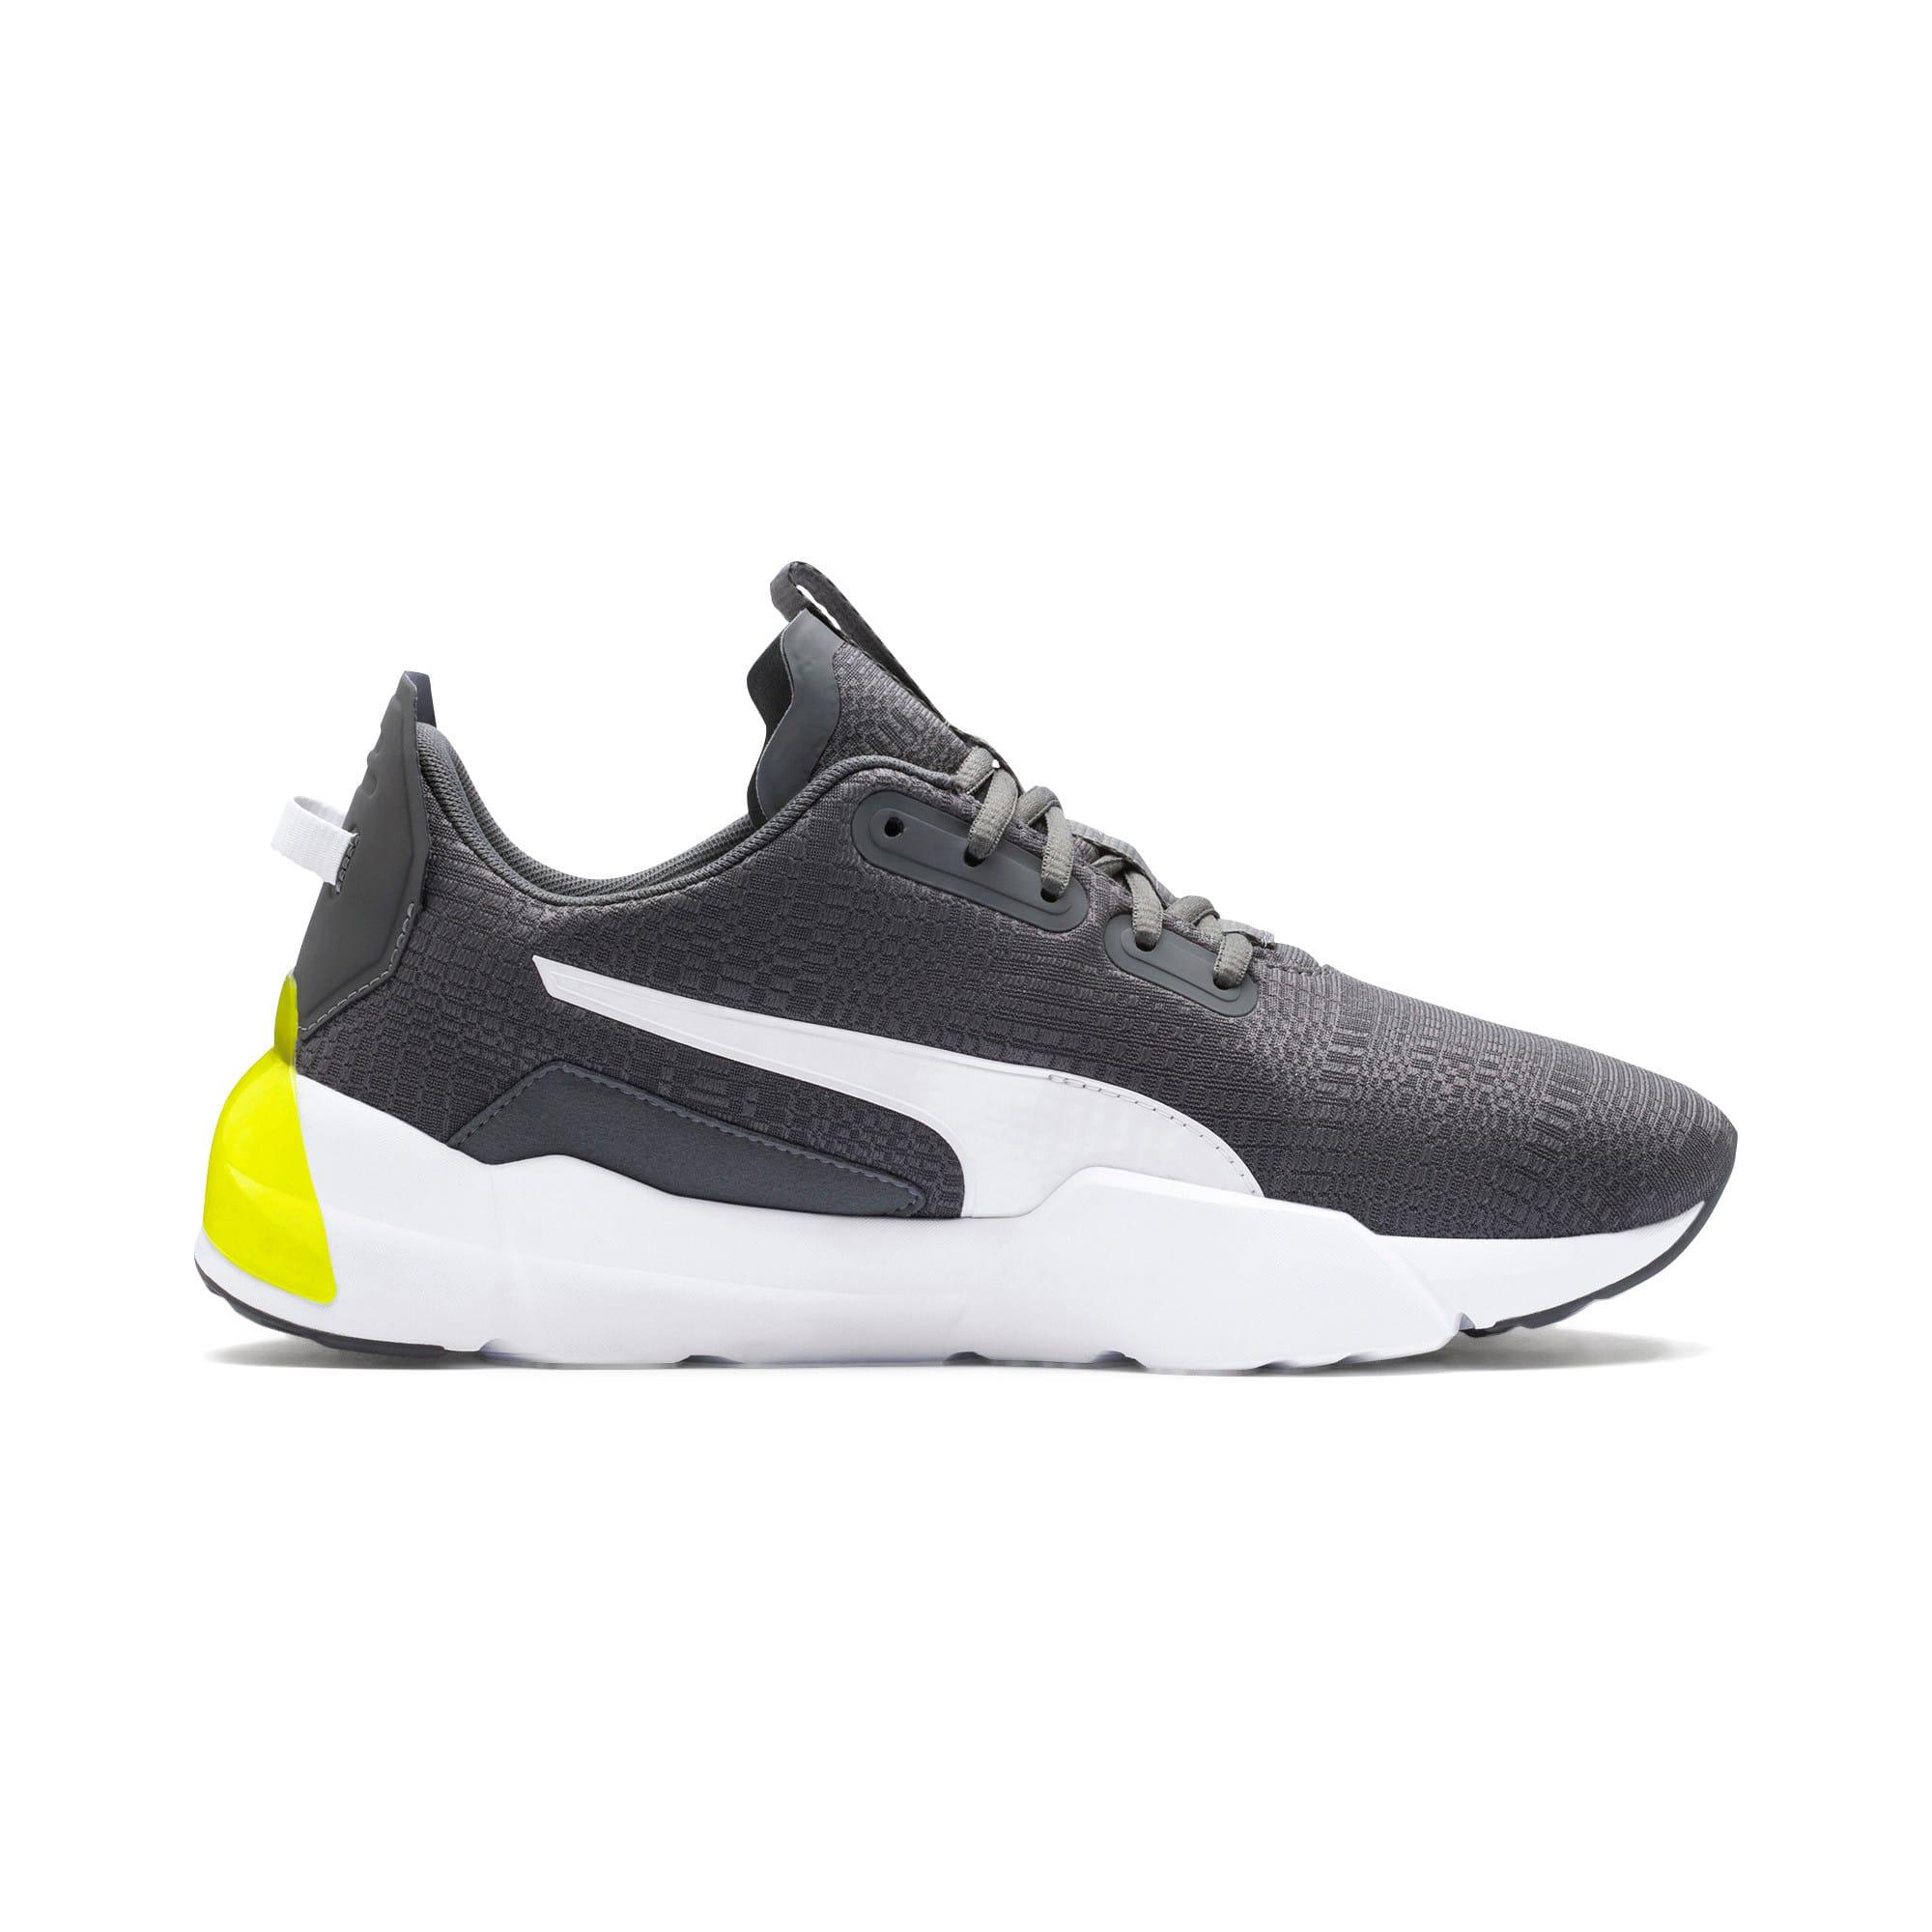 Thumbnail 6 of CELL Phase Lights Men's Training Shoes, CASTLEROCK-Yellow Alert, medium